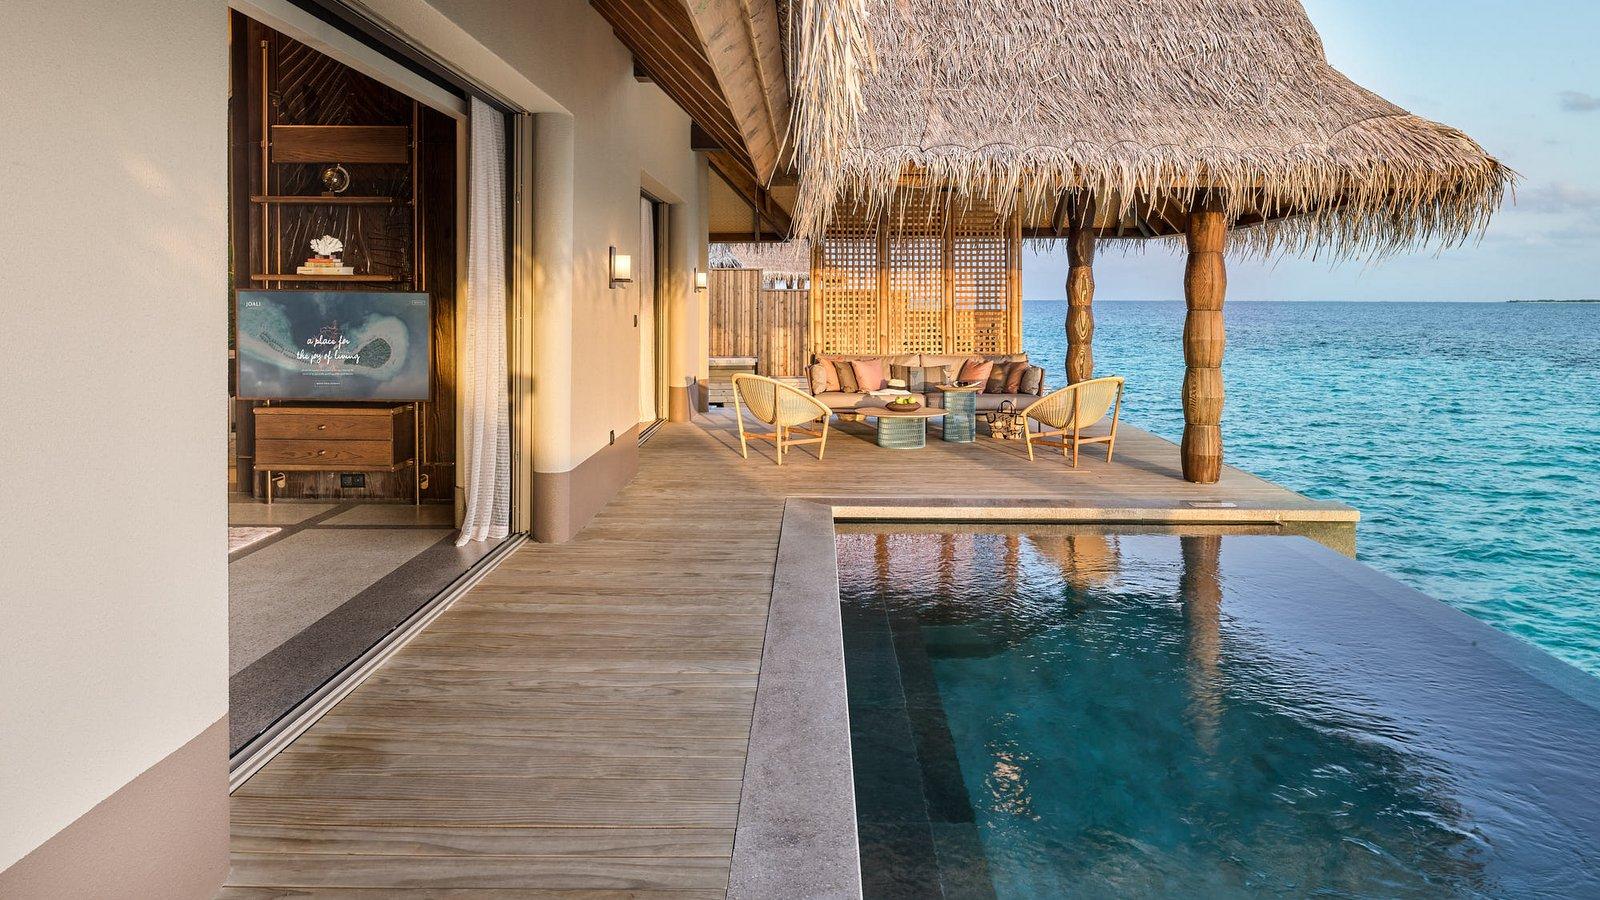 Мальдивы, отель Joali Maldives, номер Luxury Water Villa with Pool